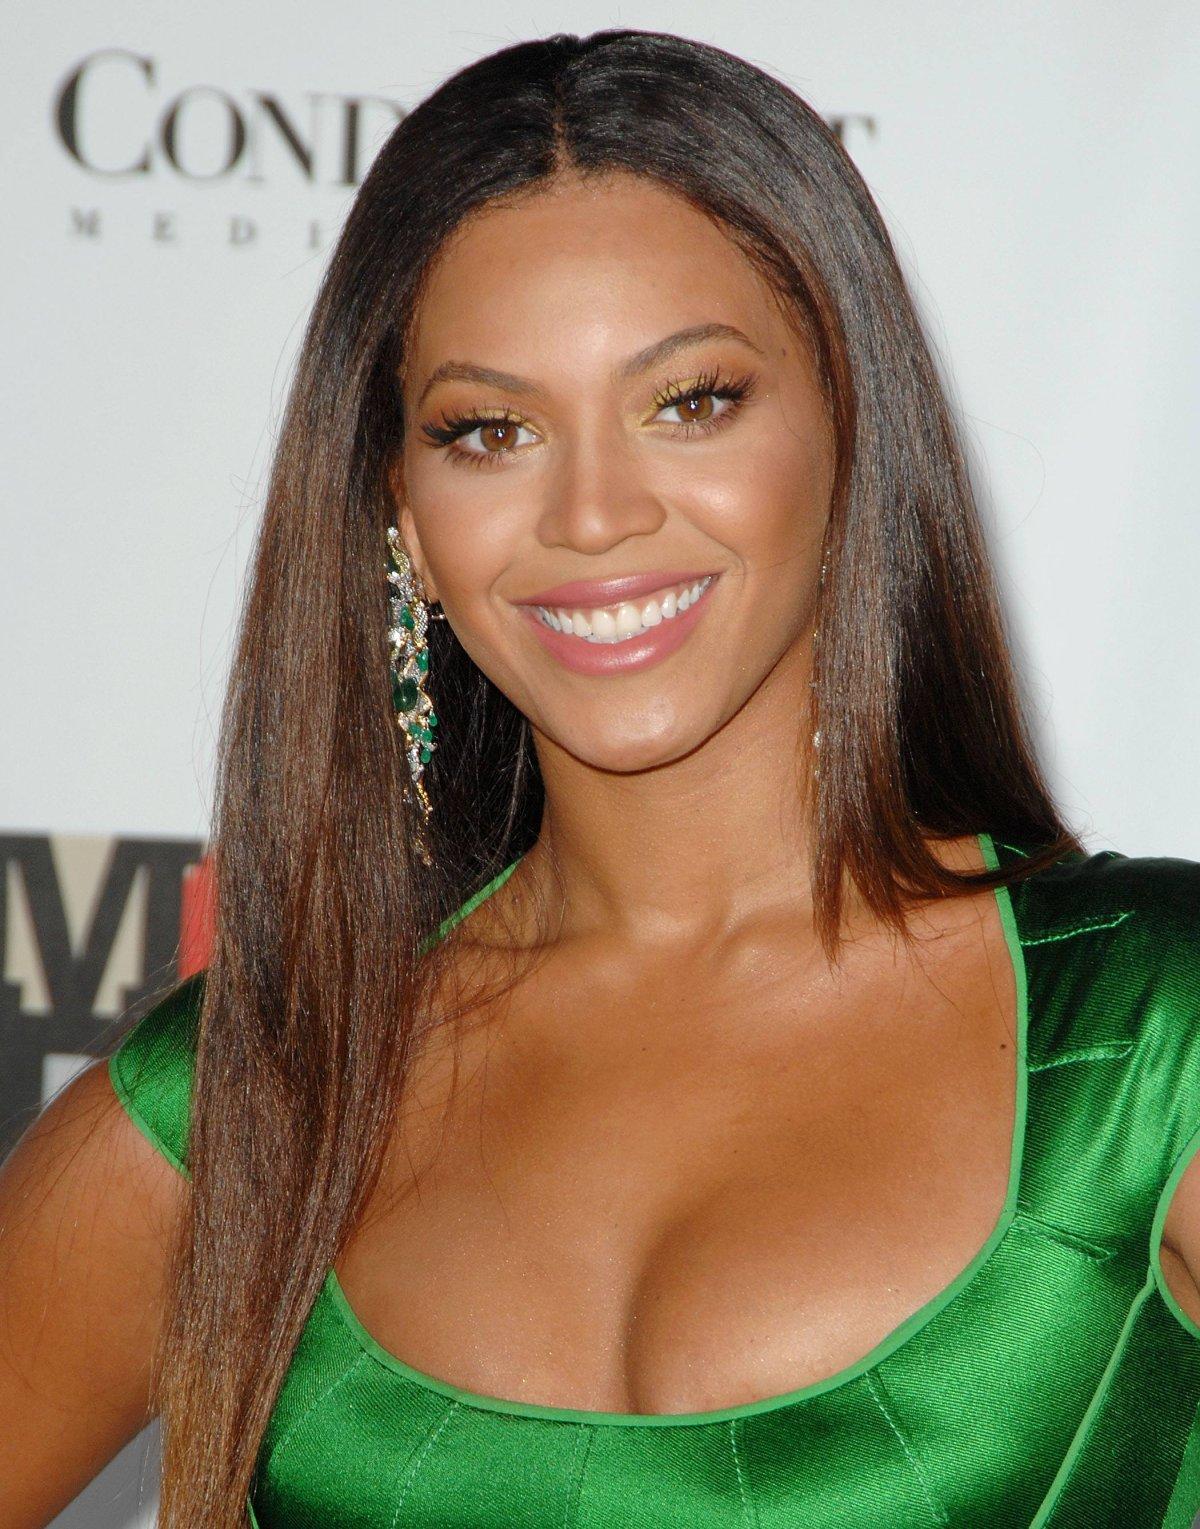 http://2.bp.blogspot.com/-FMK8vTA54wE/T9RNymf-iHI/AAAAAAAAAeo/c5Pw-pmUQ1Q/s1600/Beyonce+Knowles+5.jpg